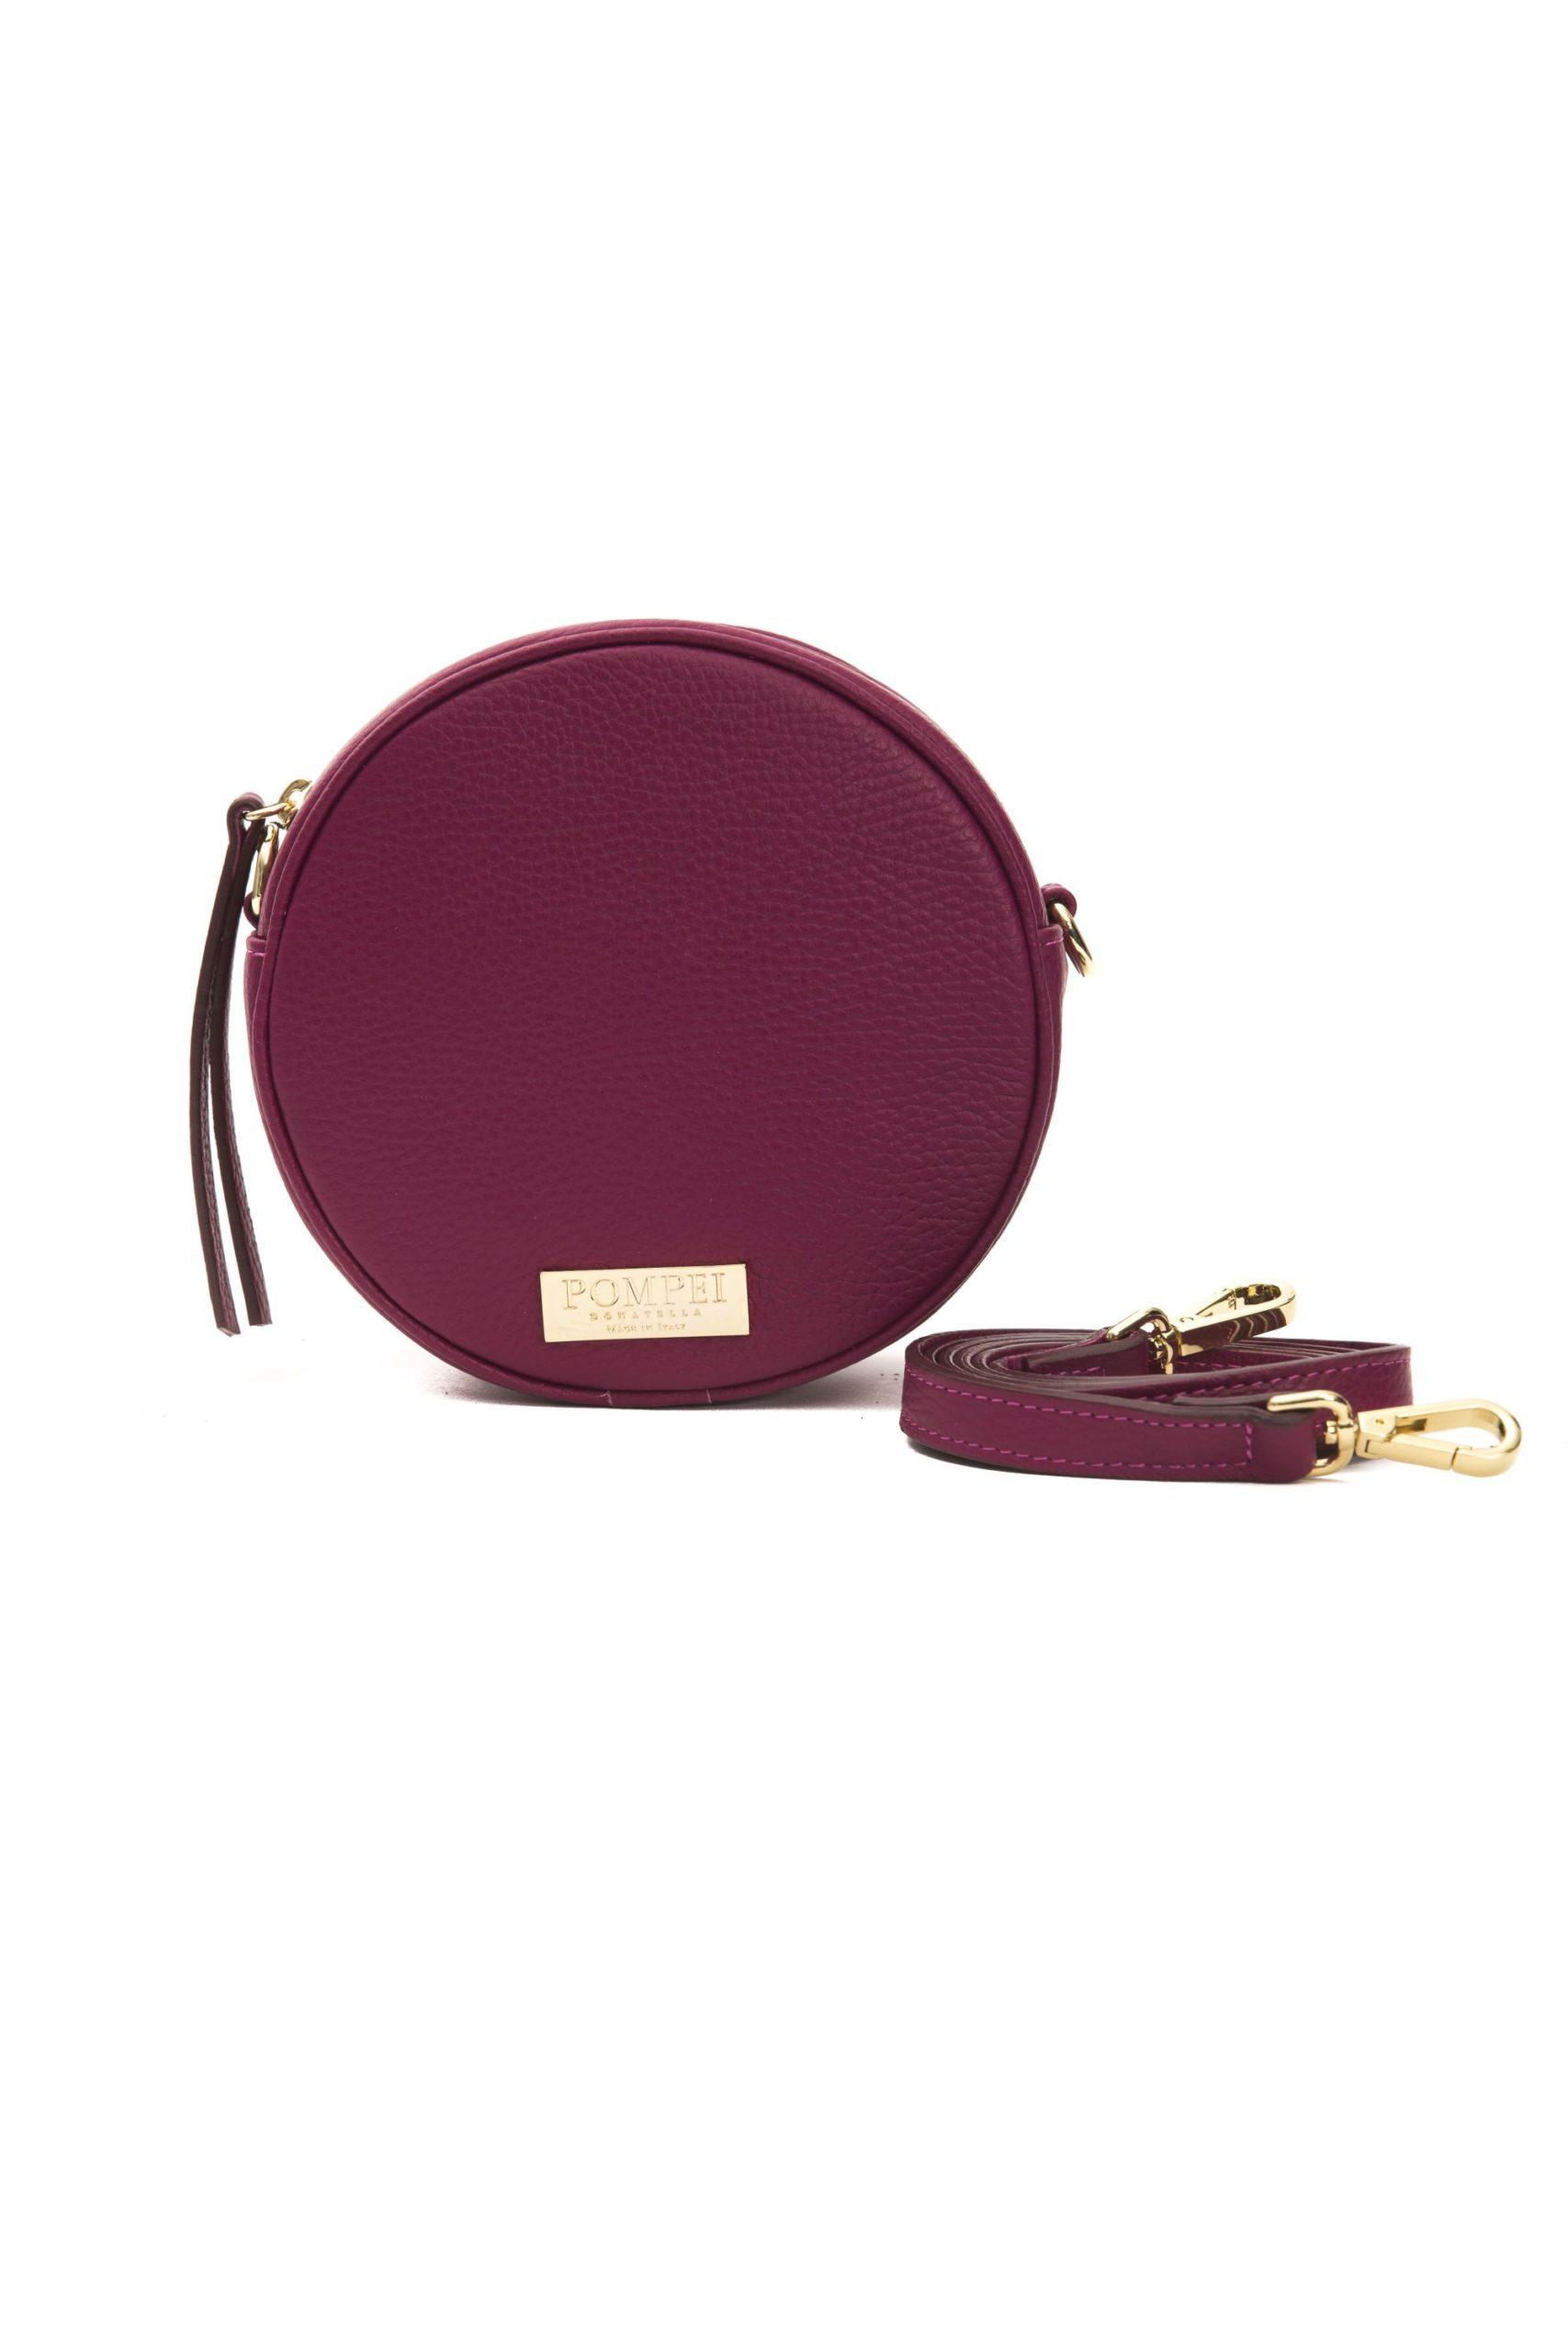 Pompei Donatella Women's Amaranto Crossbody Bag Burgundy PO1004933